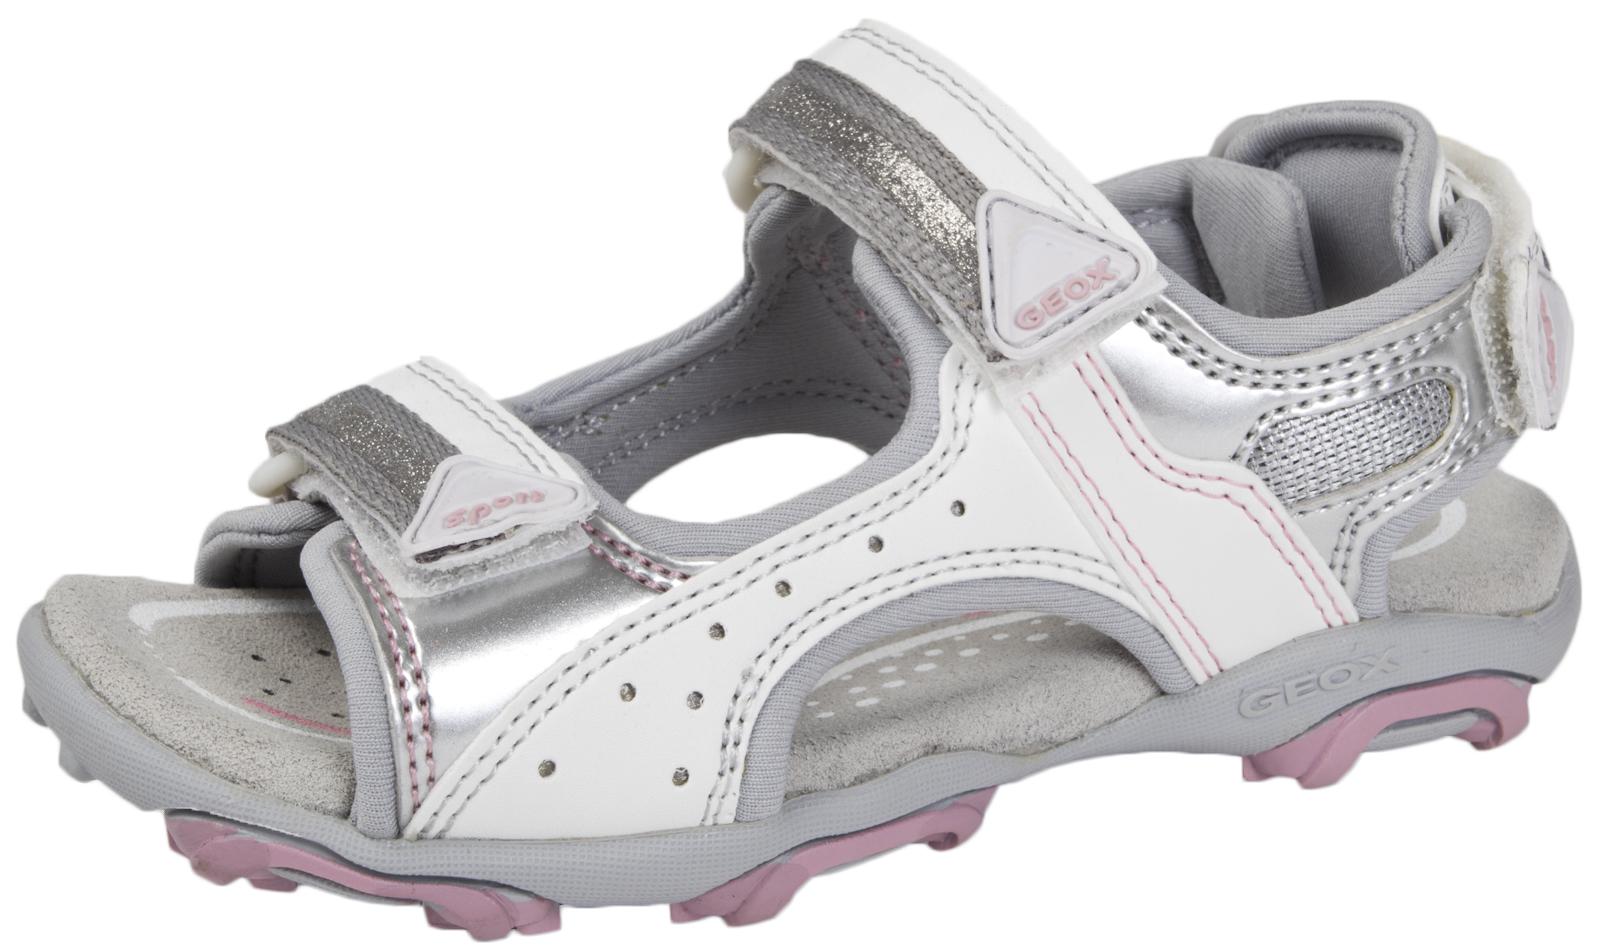 78c342fc5c48 Geox Girls Leather Sandals Summer Beach Walking Comfort Glitter Shoes  Holidays